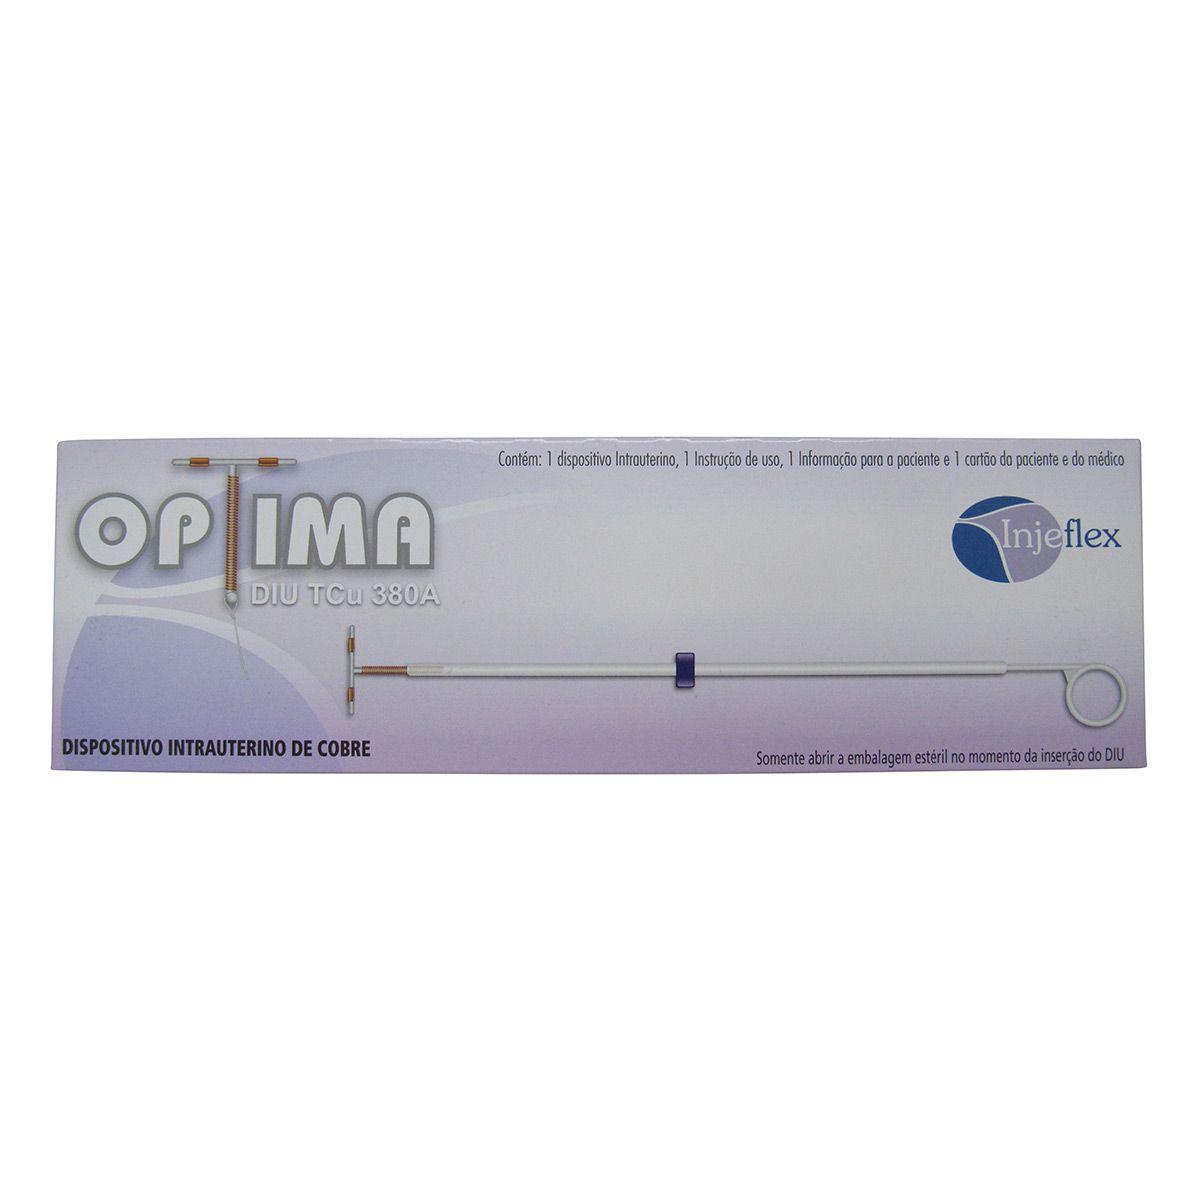 Diu Optima TCu 380A Intrauterino de Cobre Injeflex